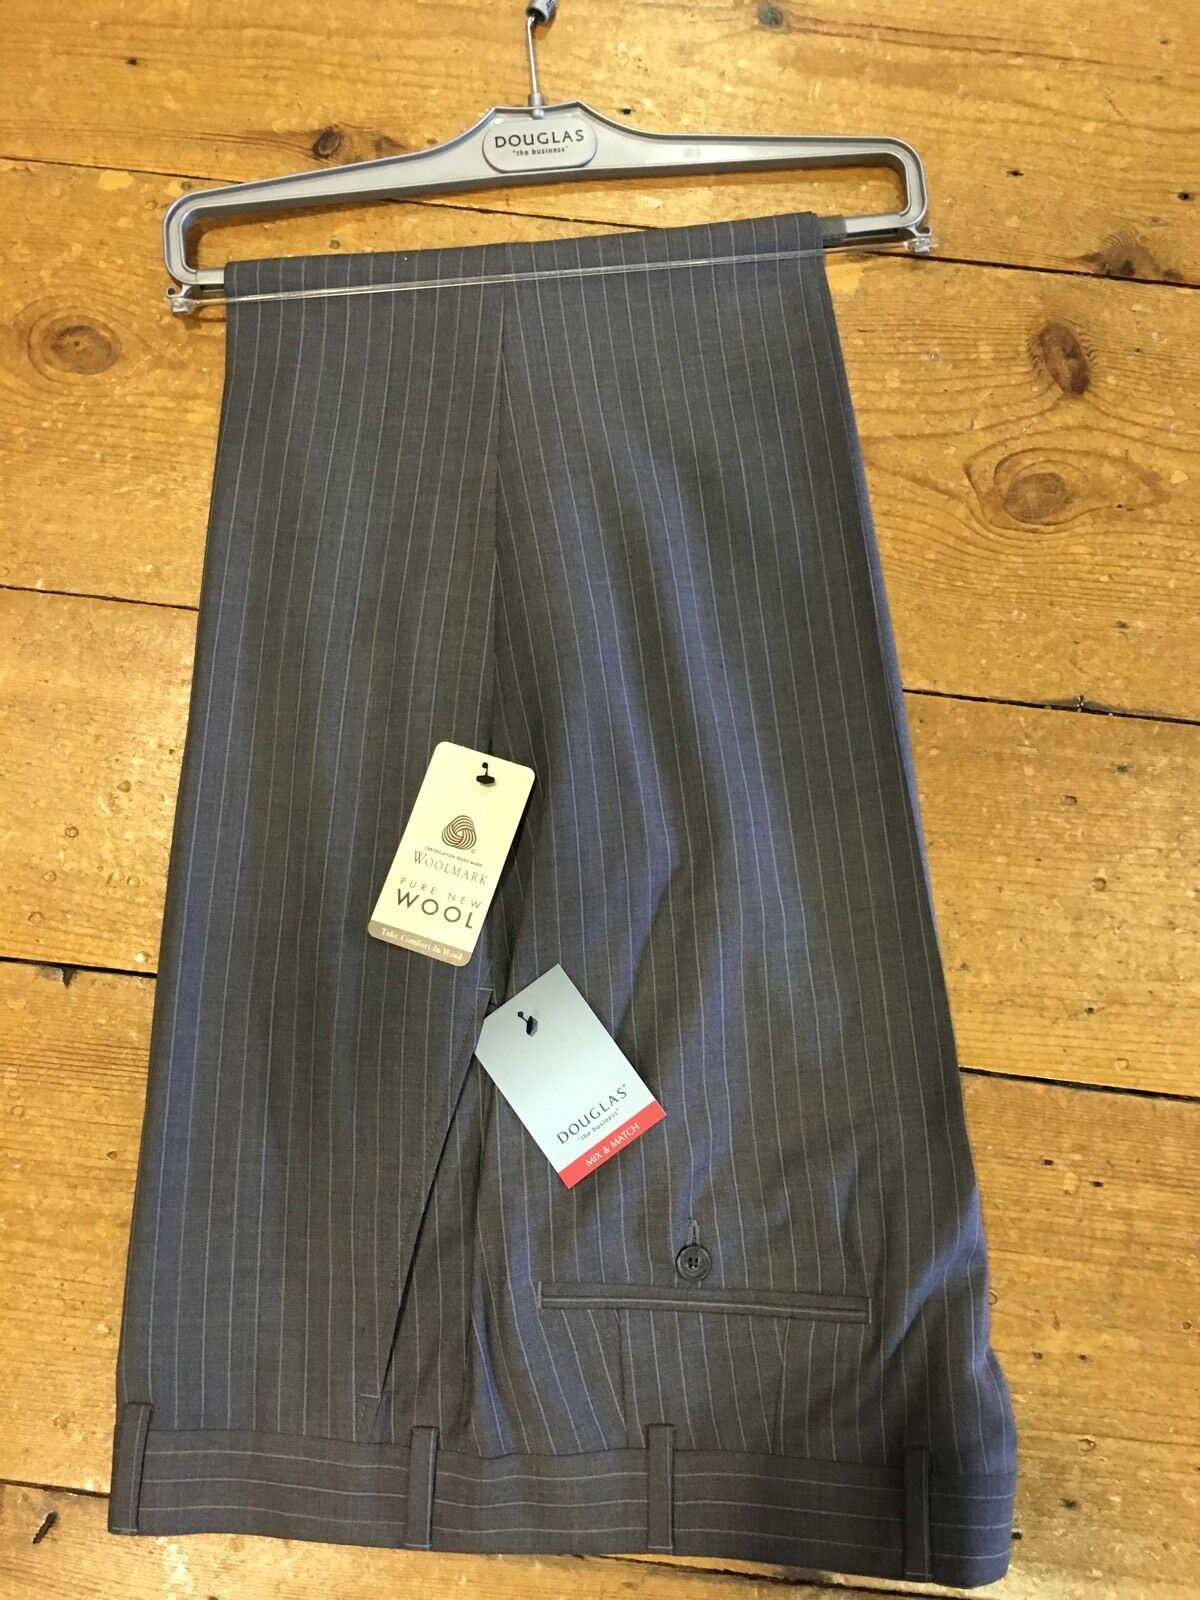 Douglas 100% Wool Striped Suit Trousers Grey - 54R. WAS .99